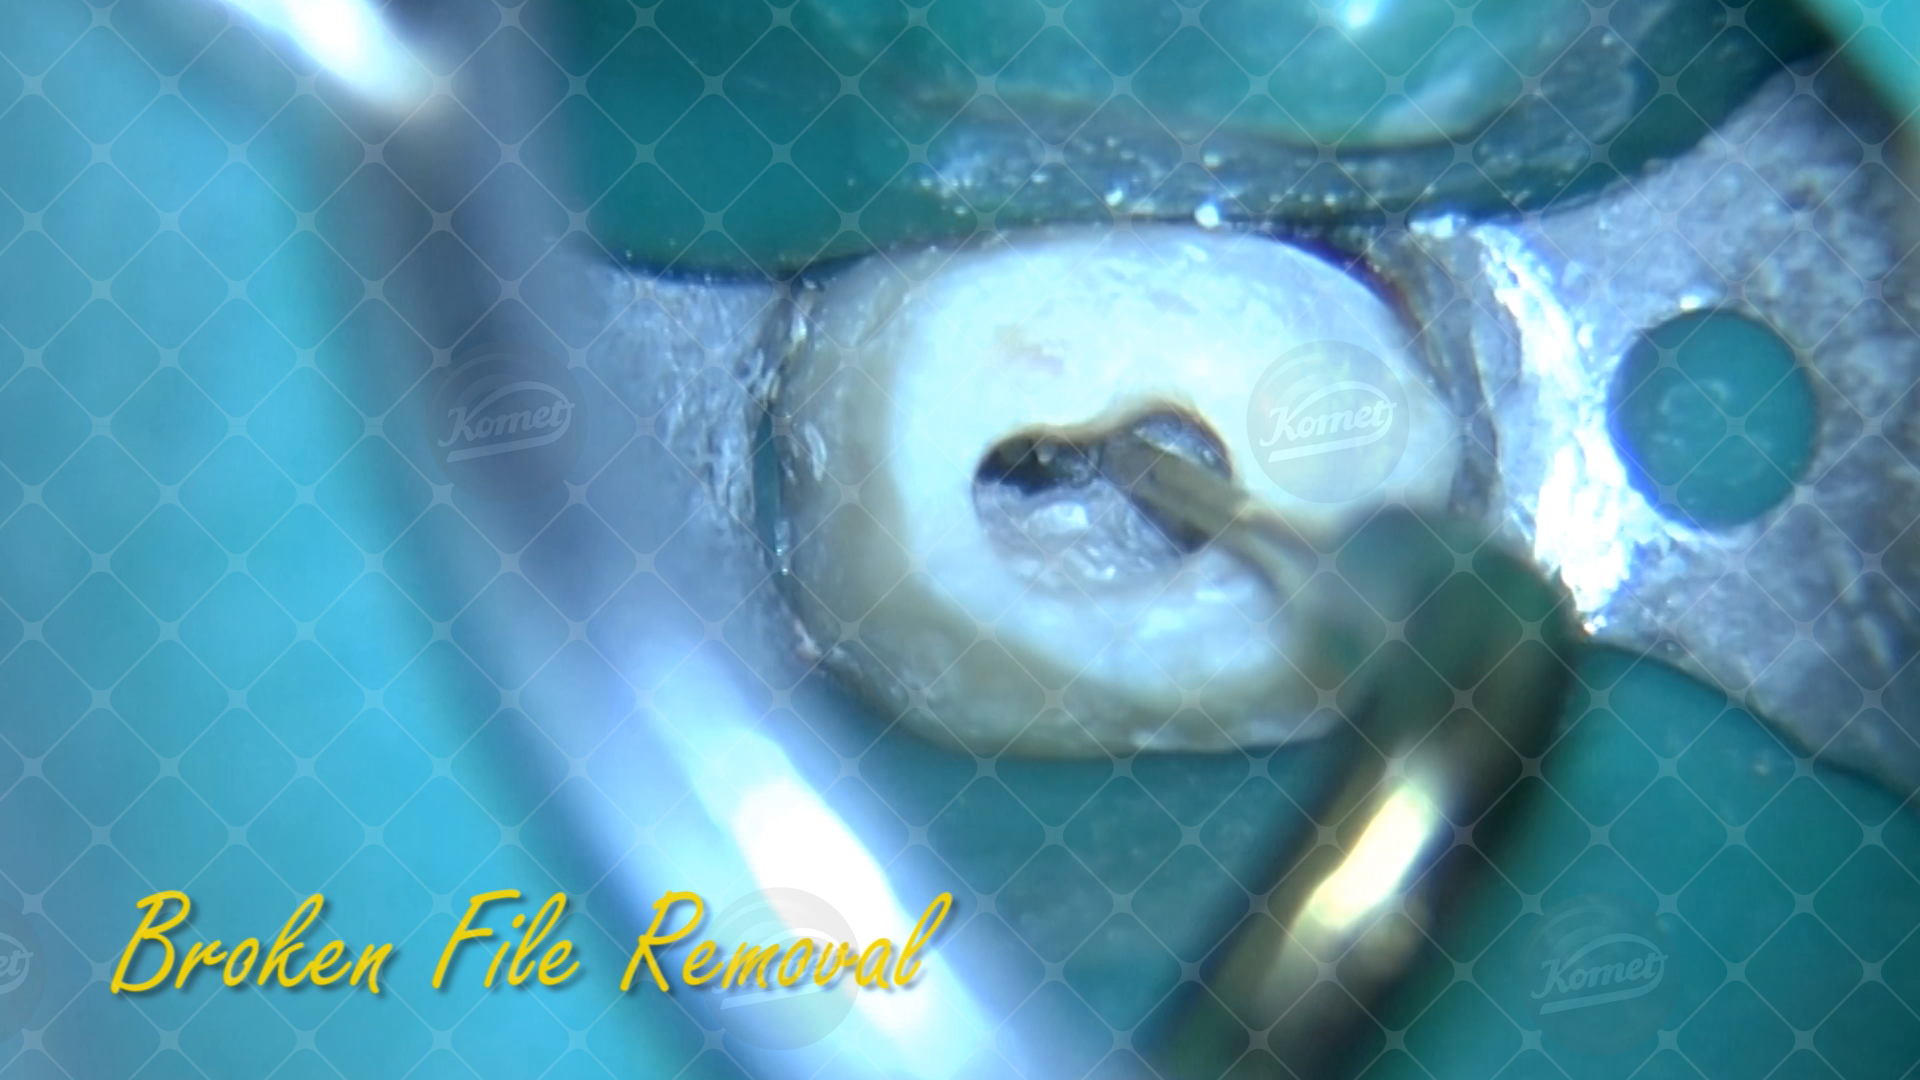 4 Broken file removal Endo & Resto by Alessandro Fava